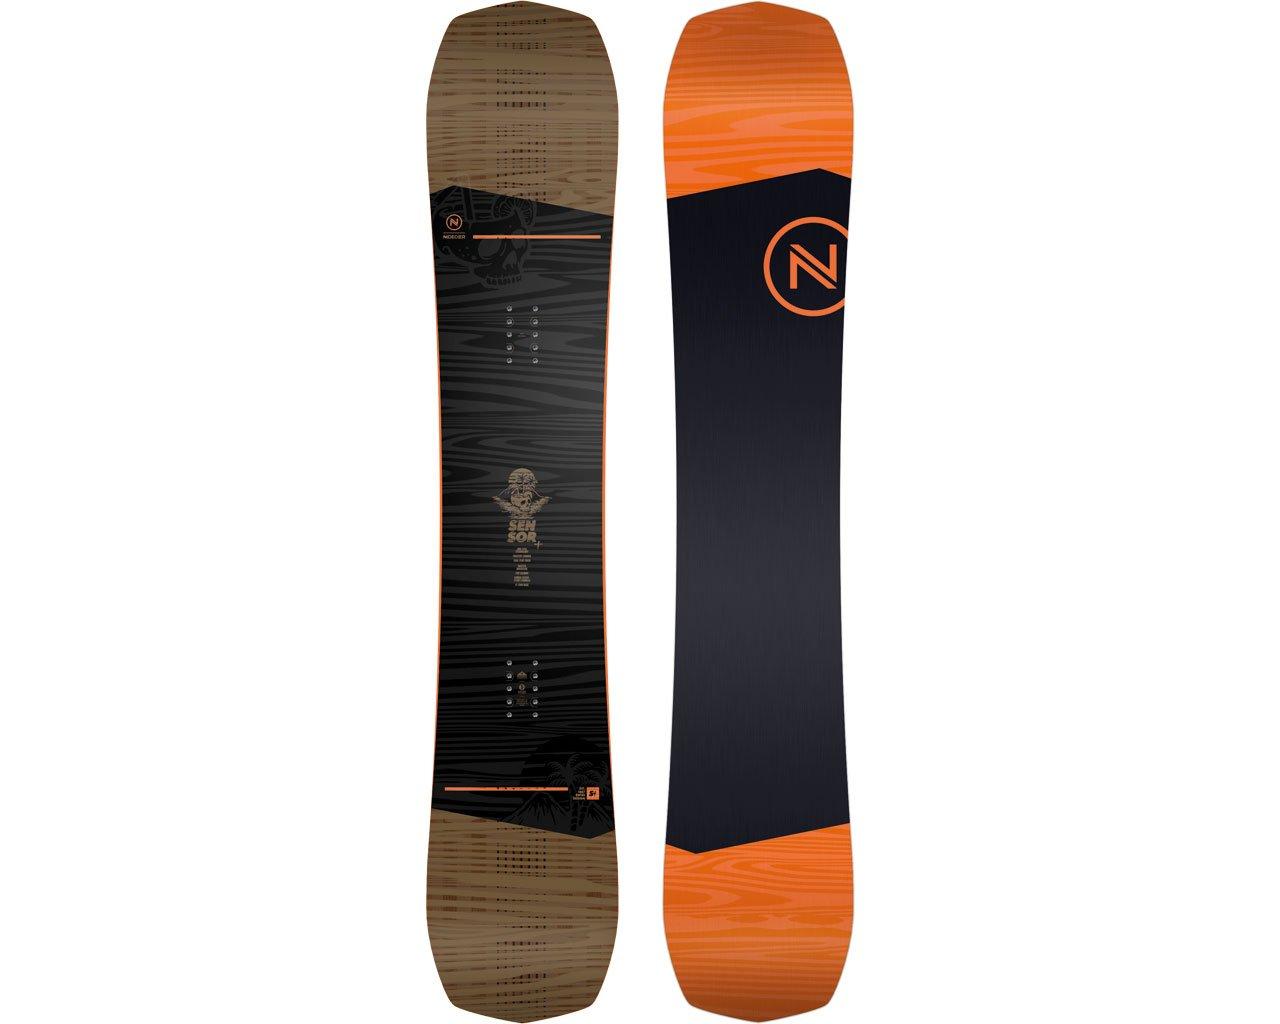 Nidecker FW20/21 Snowboard Preview